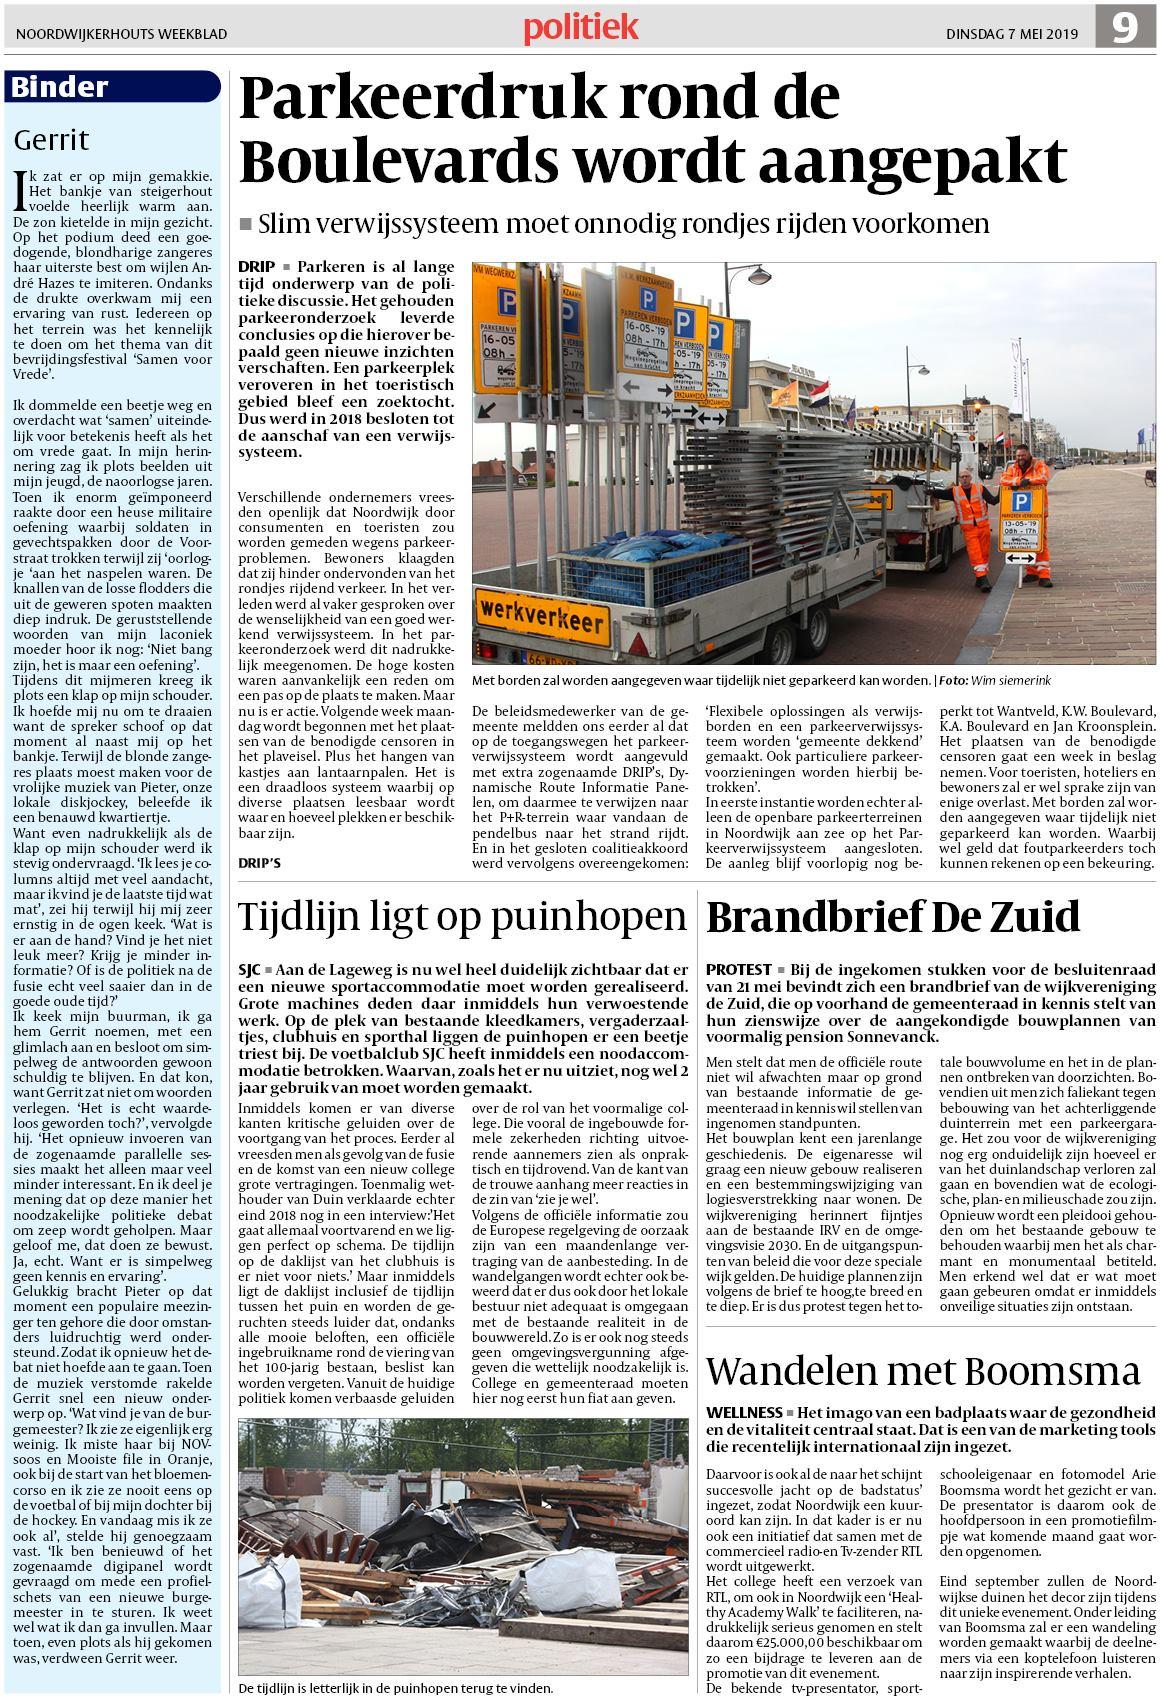 Boeren Bankje Van Steigerhout.Noordwijkerhouts Weekblad 7 Mei 2019